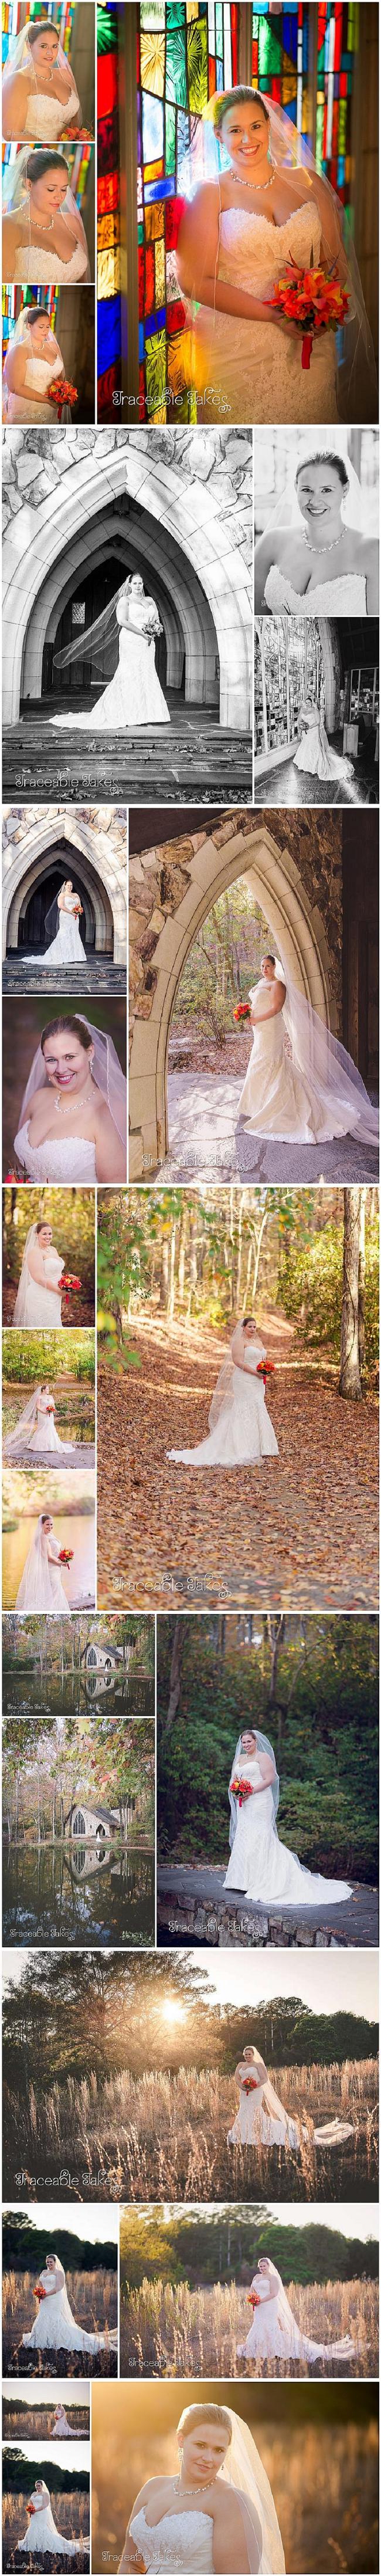 Ashley-bridal-8662_traceabletakes